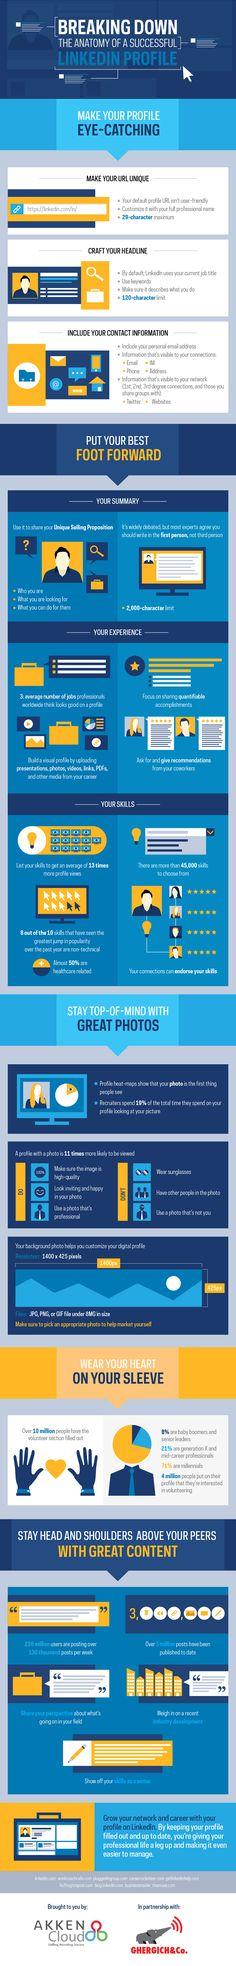 HOW TO: Create A Winning LinkedIn Profile